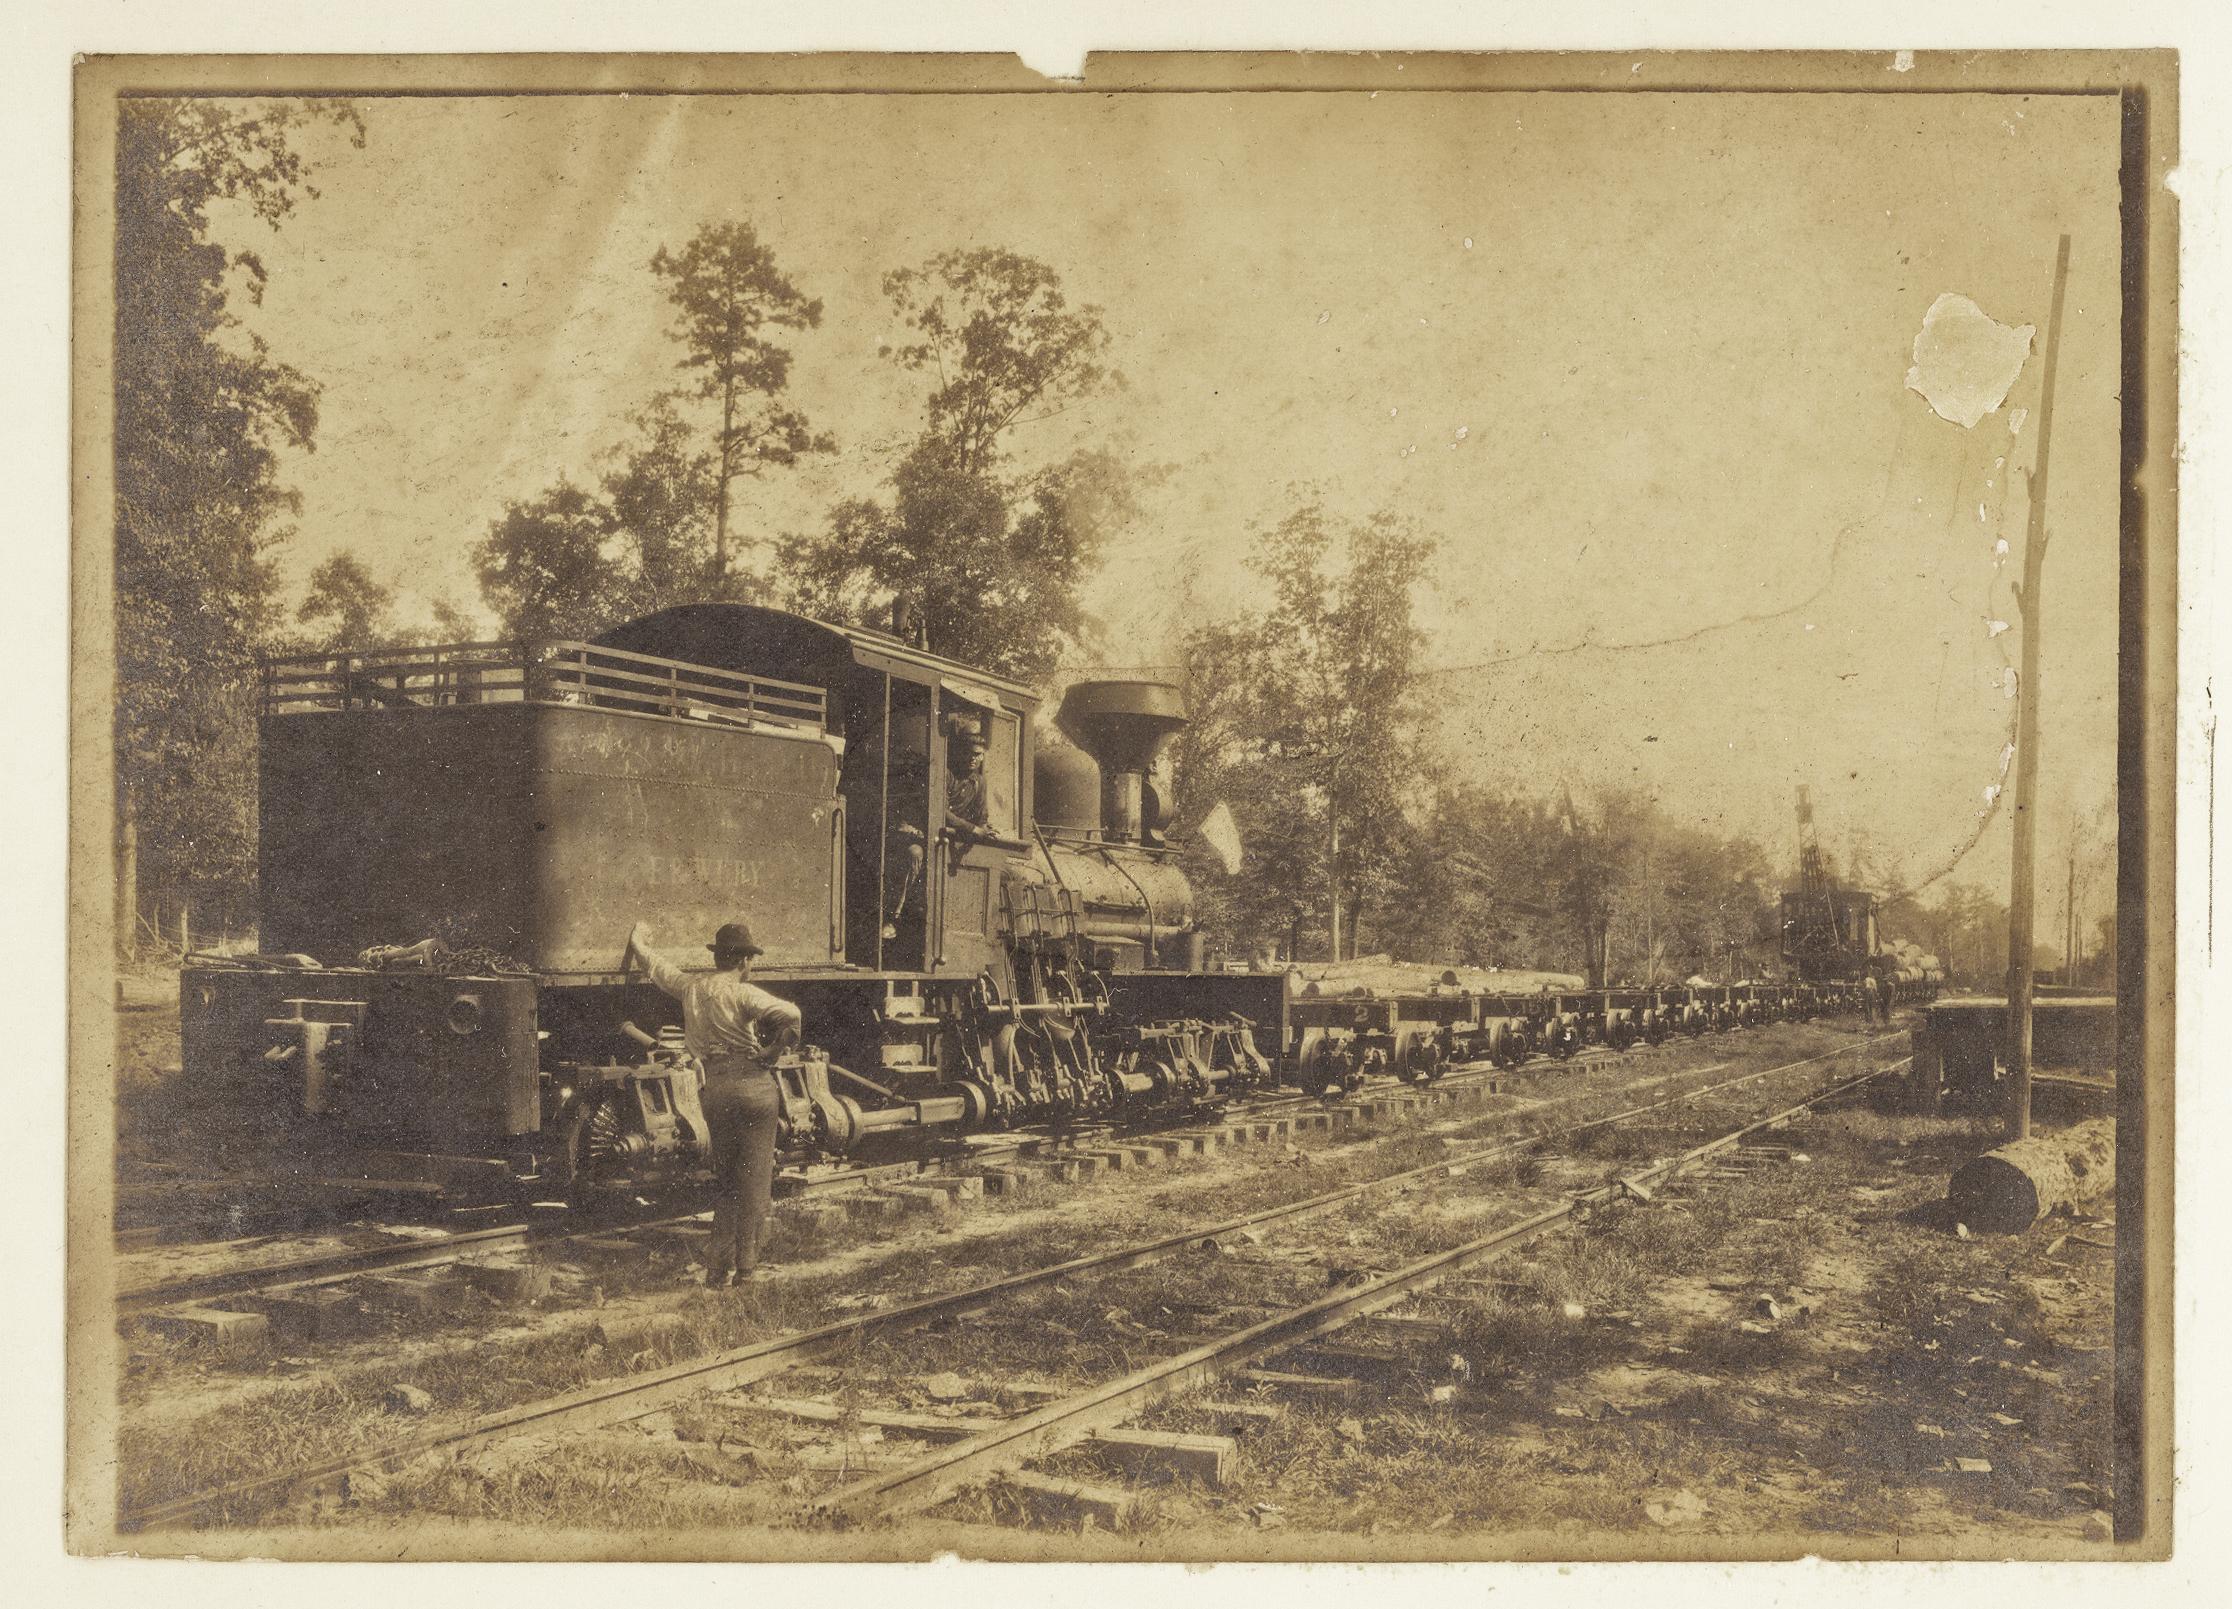 Train & Skidder on East & West Louisiana Ry. (1903)